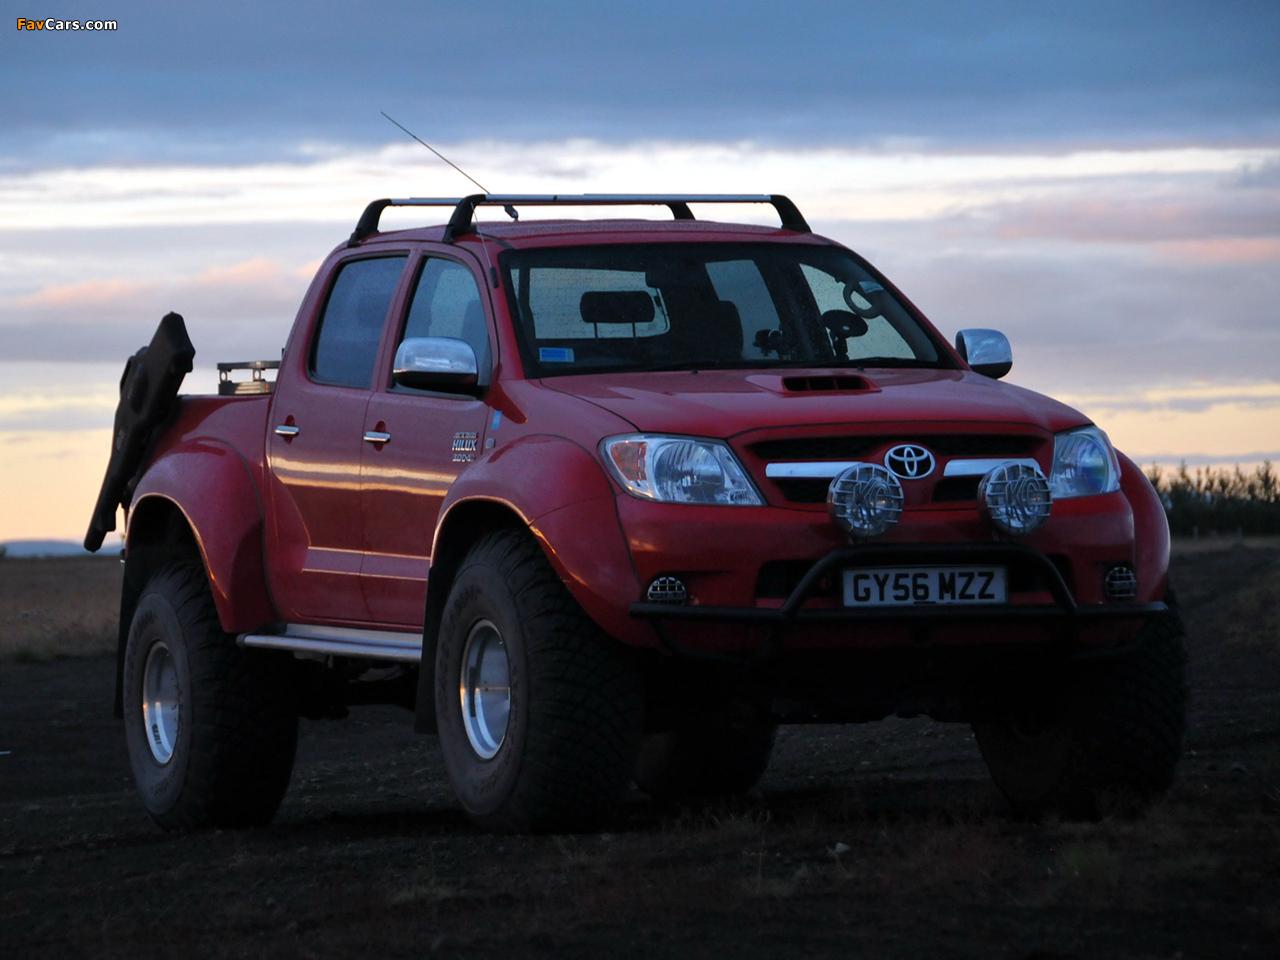 photos of arctic trucks toyota hilux invincible at38 2007. Black Bedroom Furniture Sets. Home Design Ideas